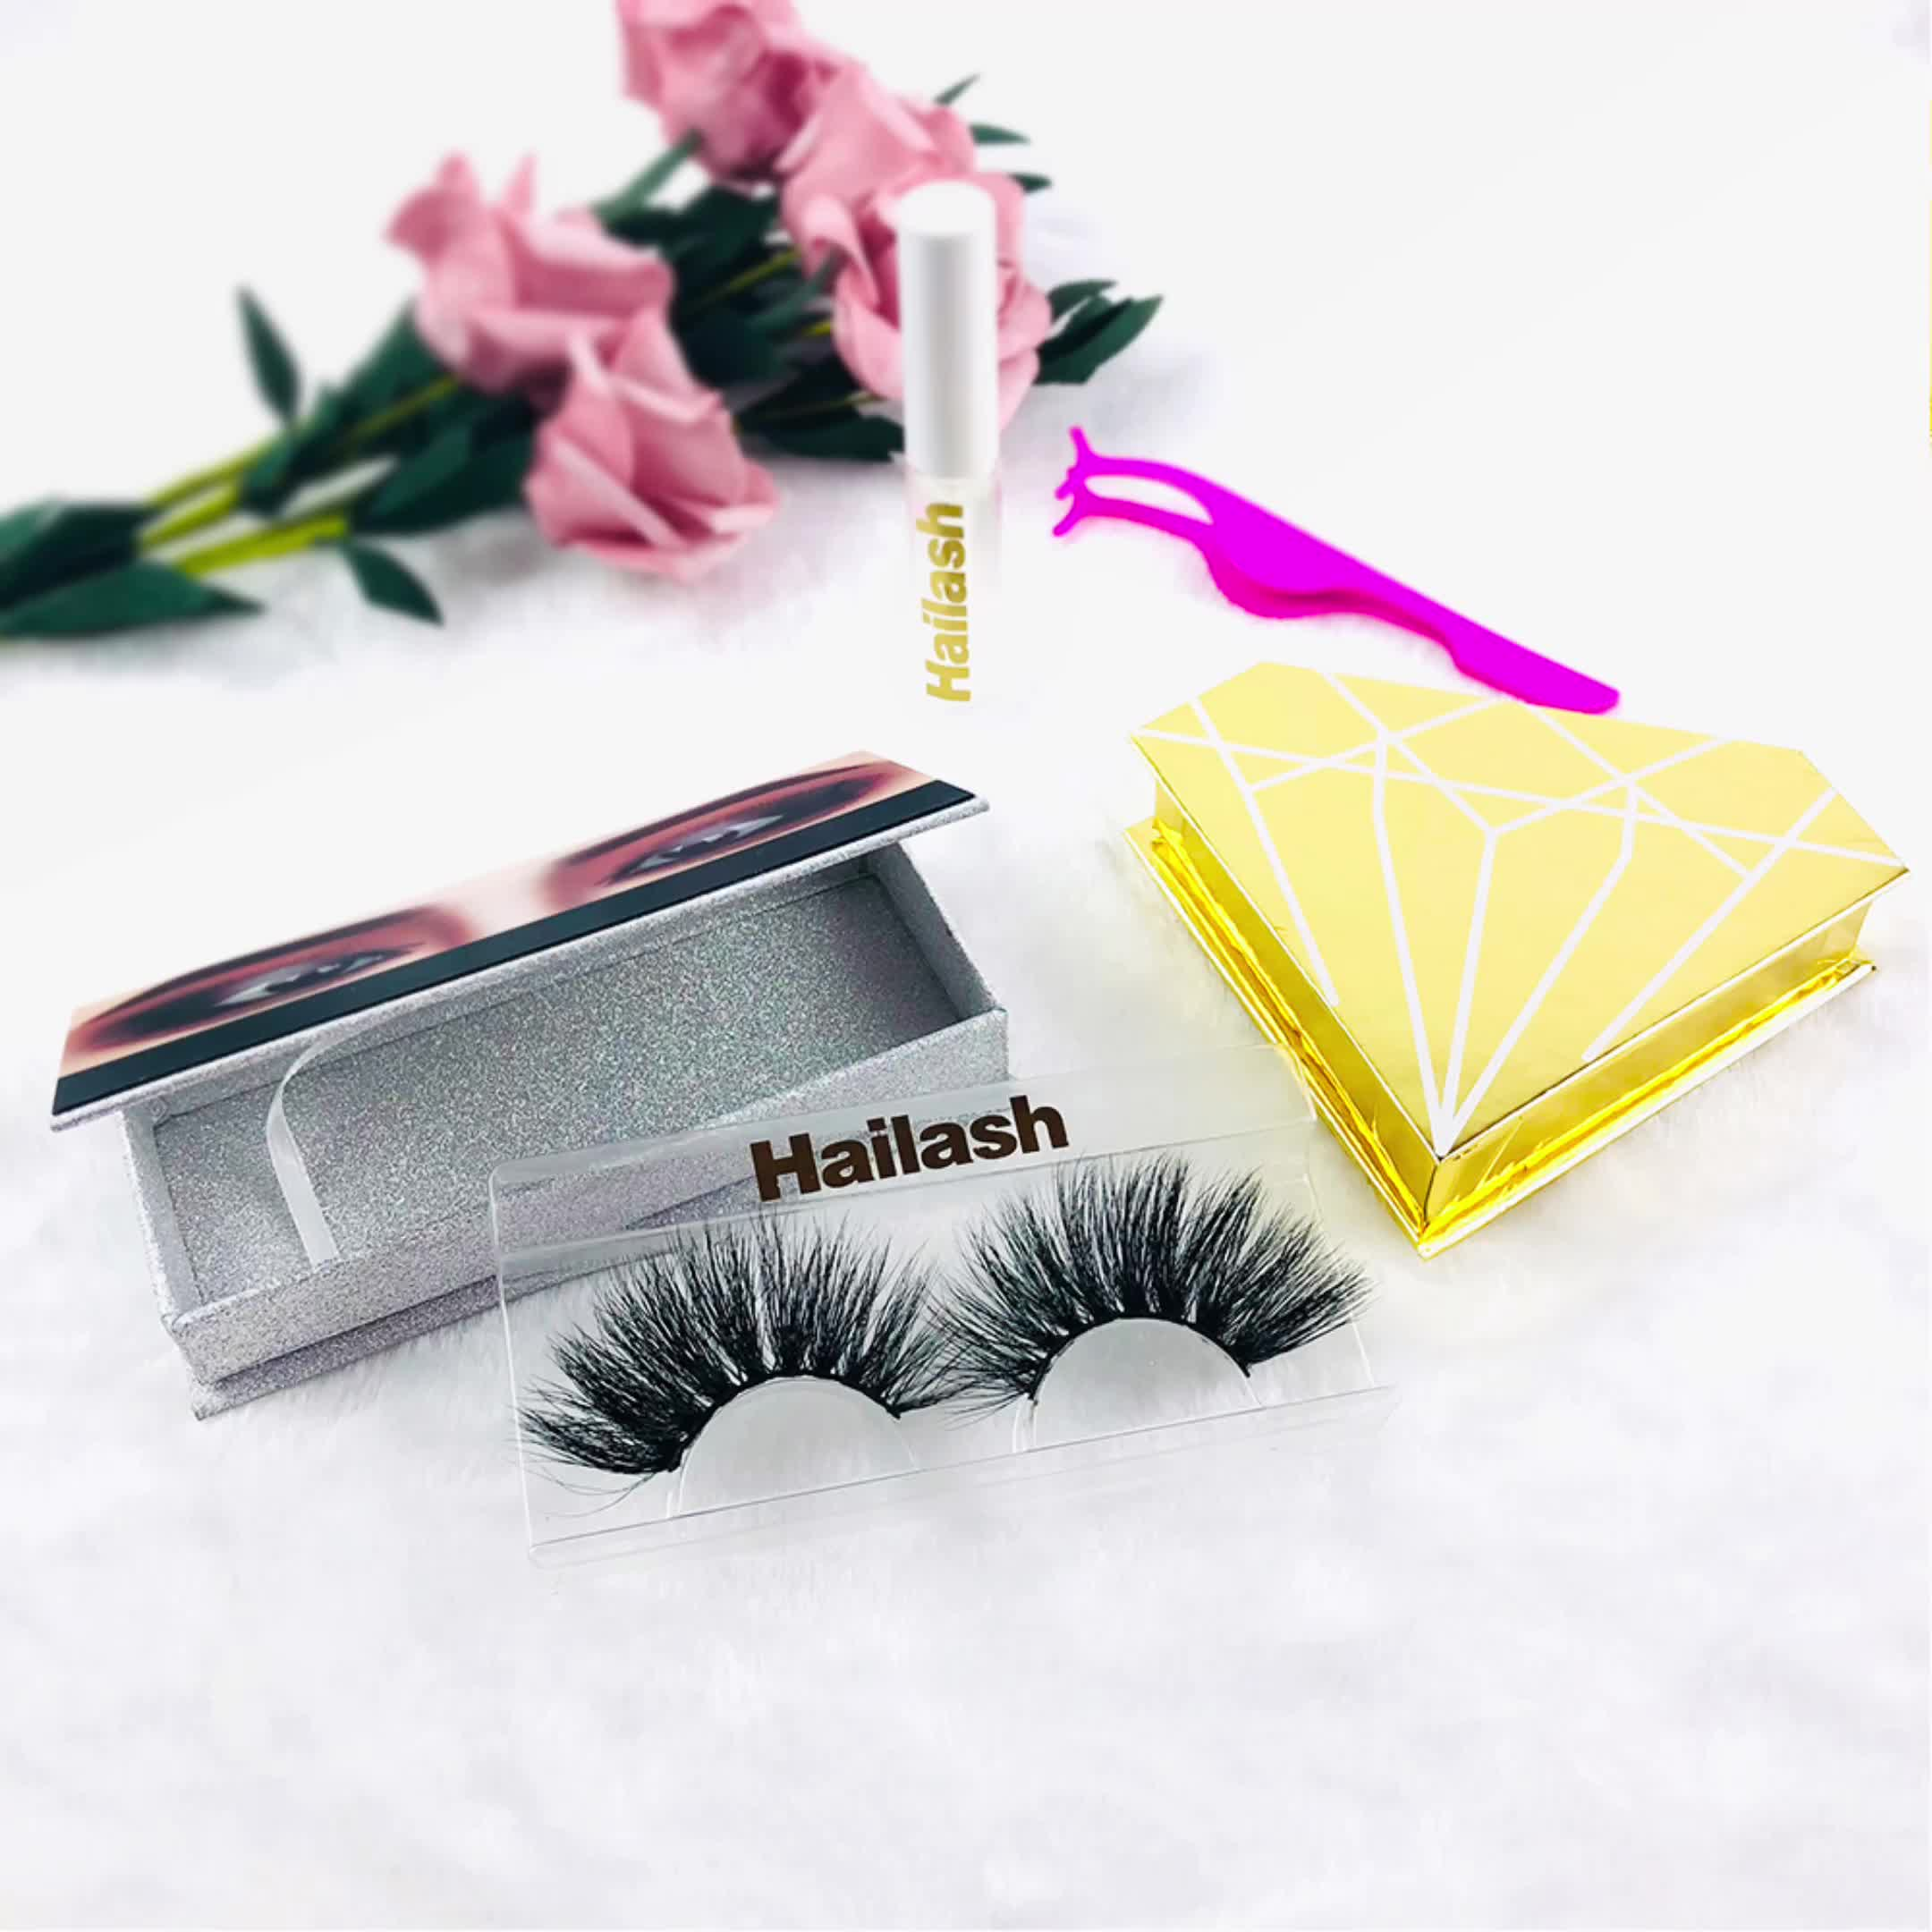 Hot sell wholesale cruelty-free 25mm real mink eyelashes natural long 25mm mink fur eyelashes